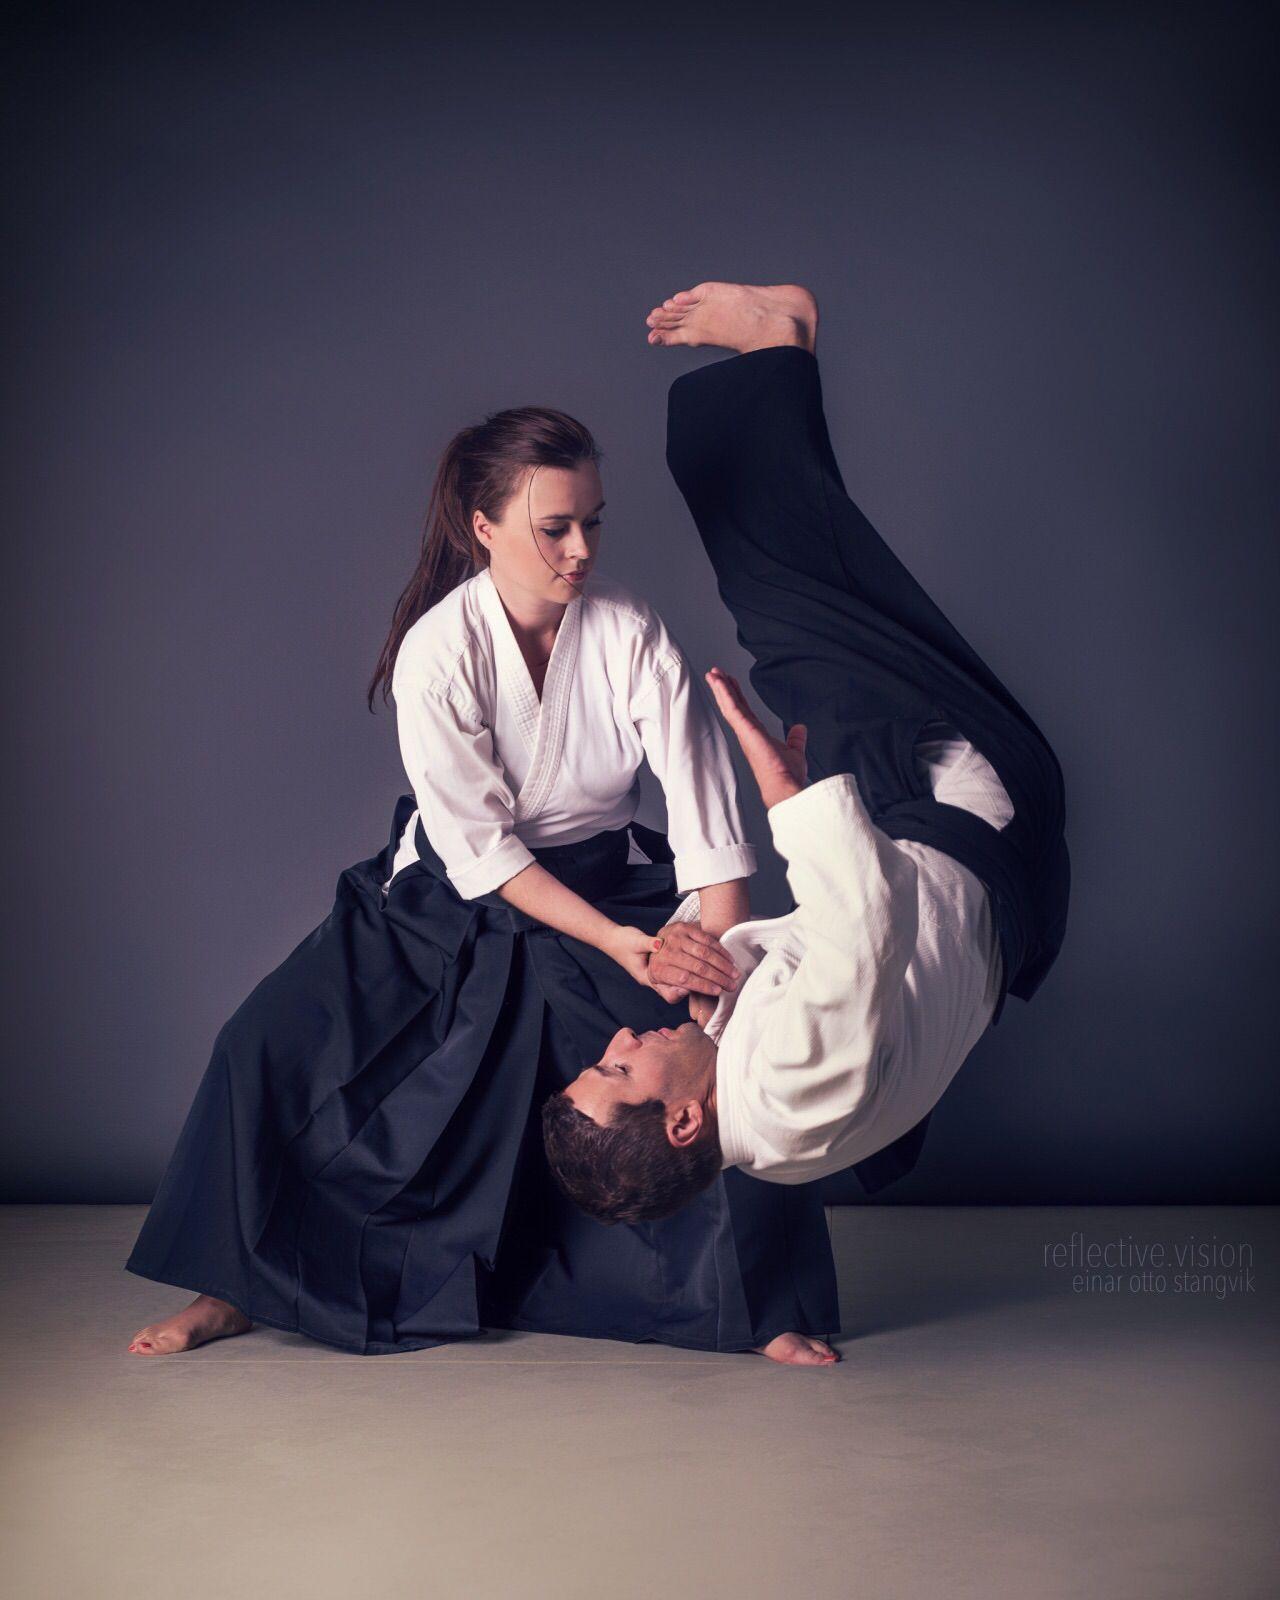 Aikido kote gaeshi martial arts women female martial